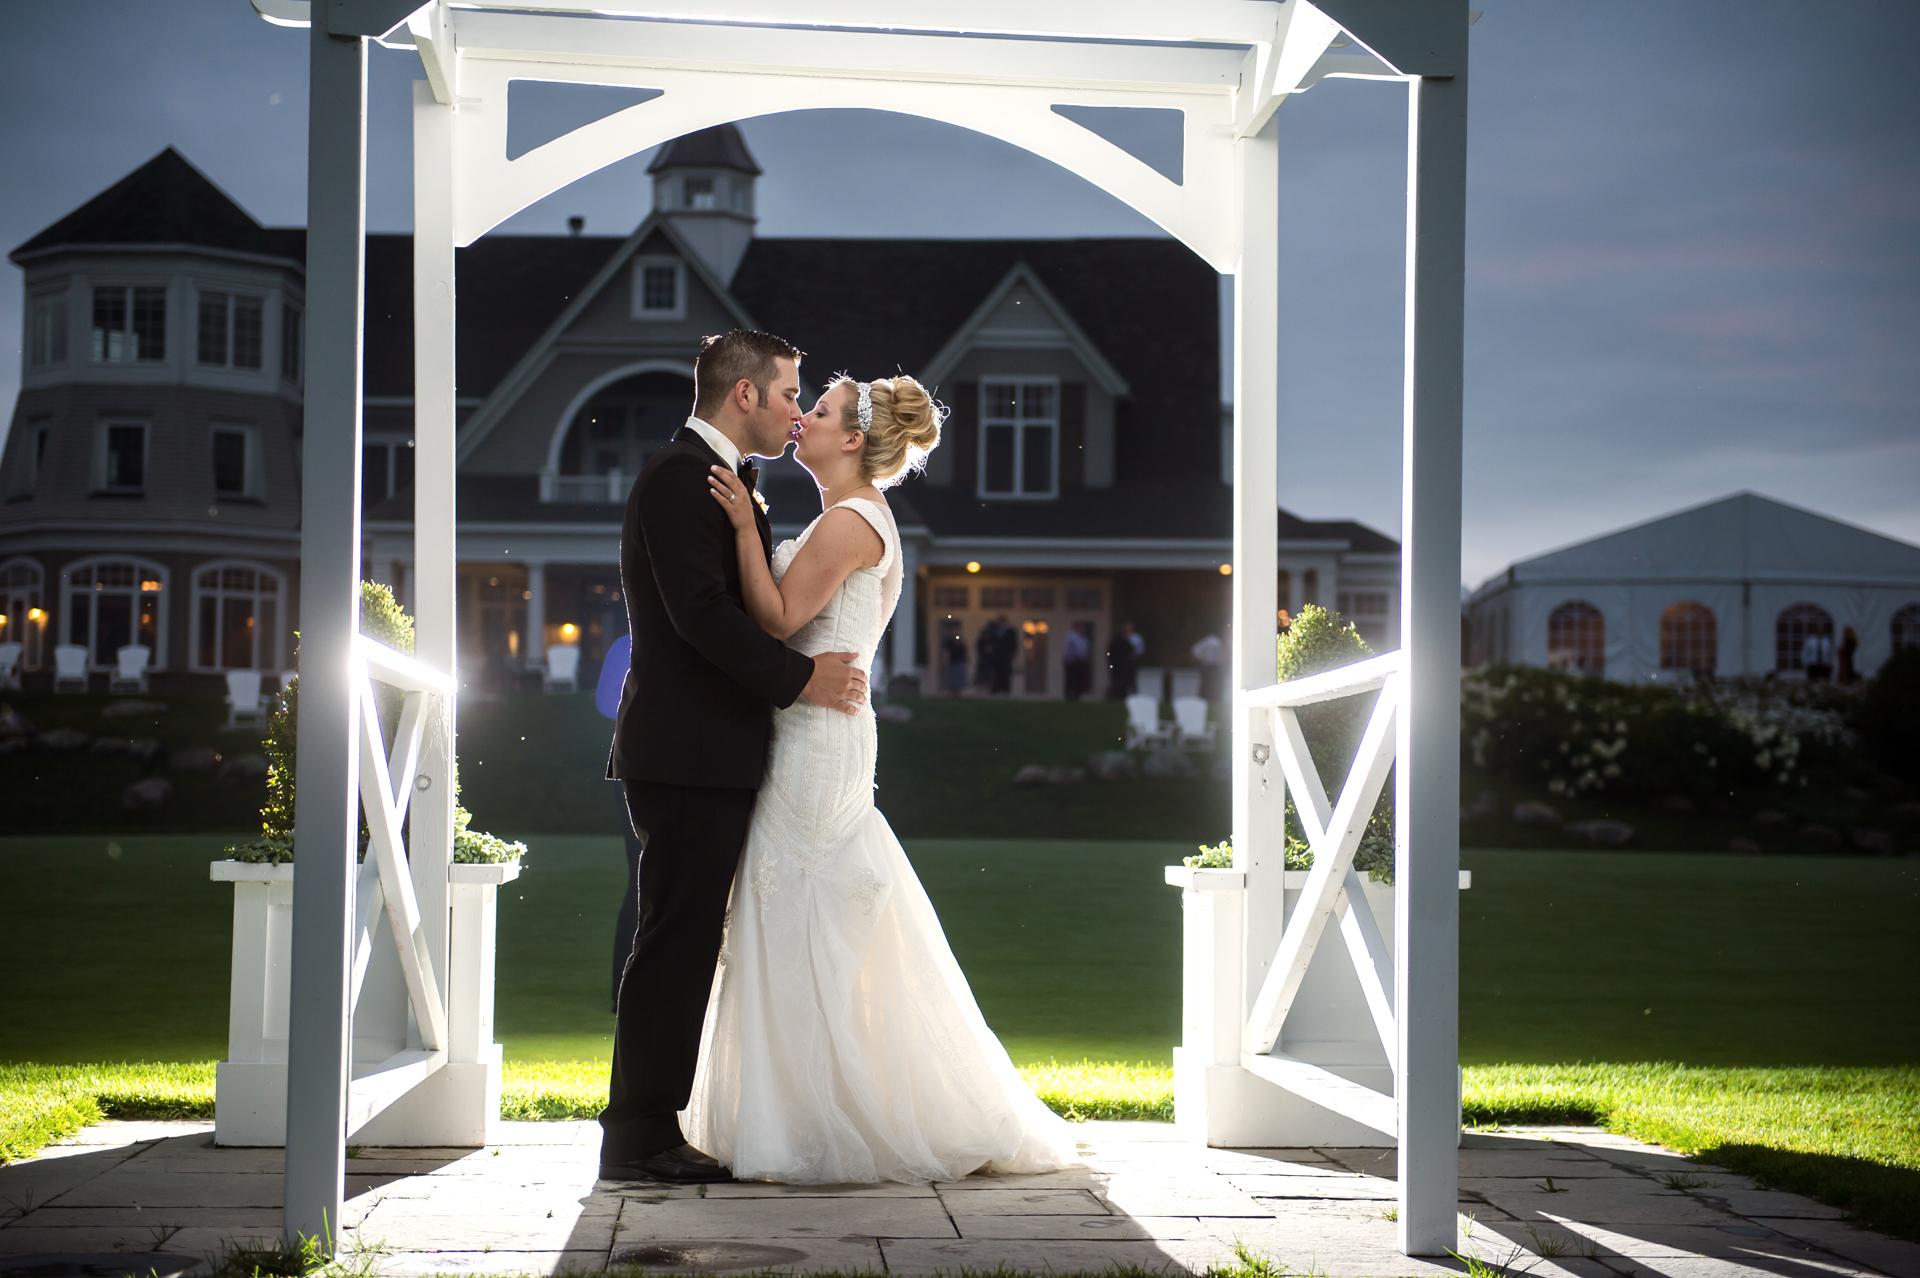 Kyle & Nikki | Cobble Beach Wedding | 022